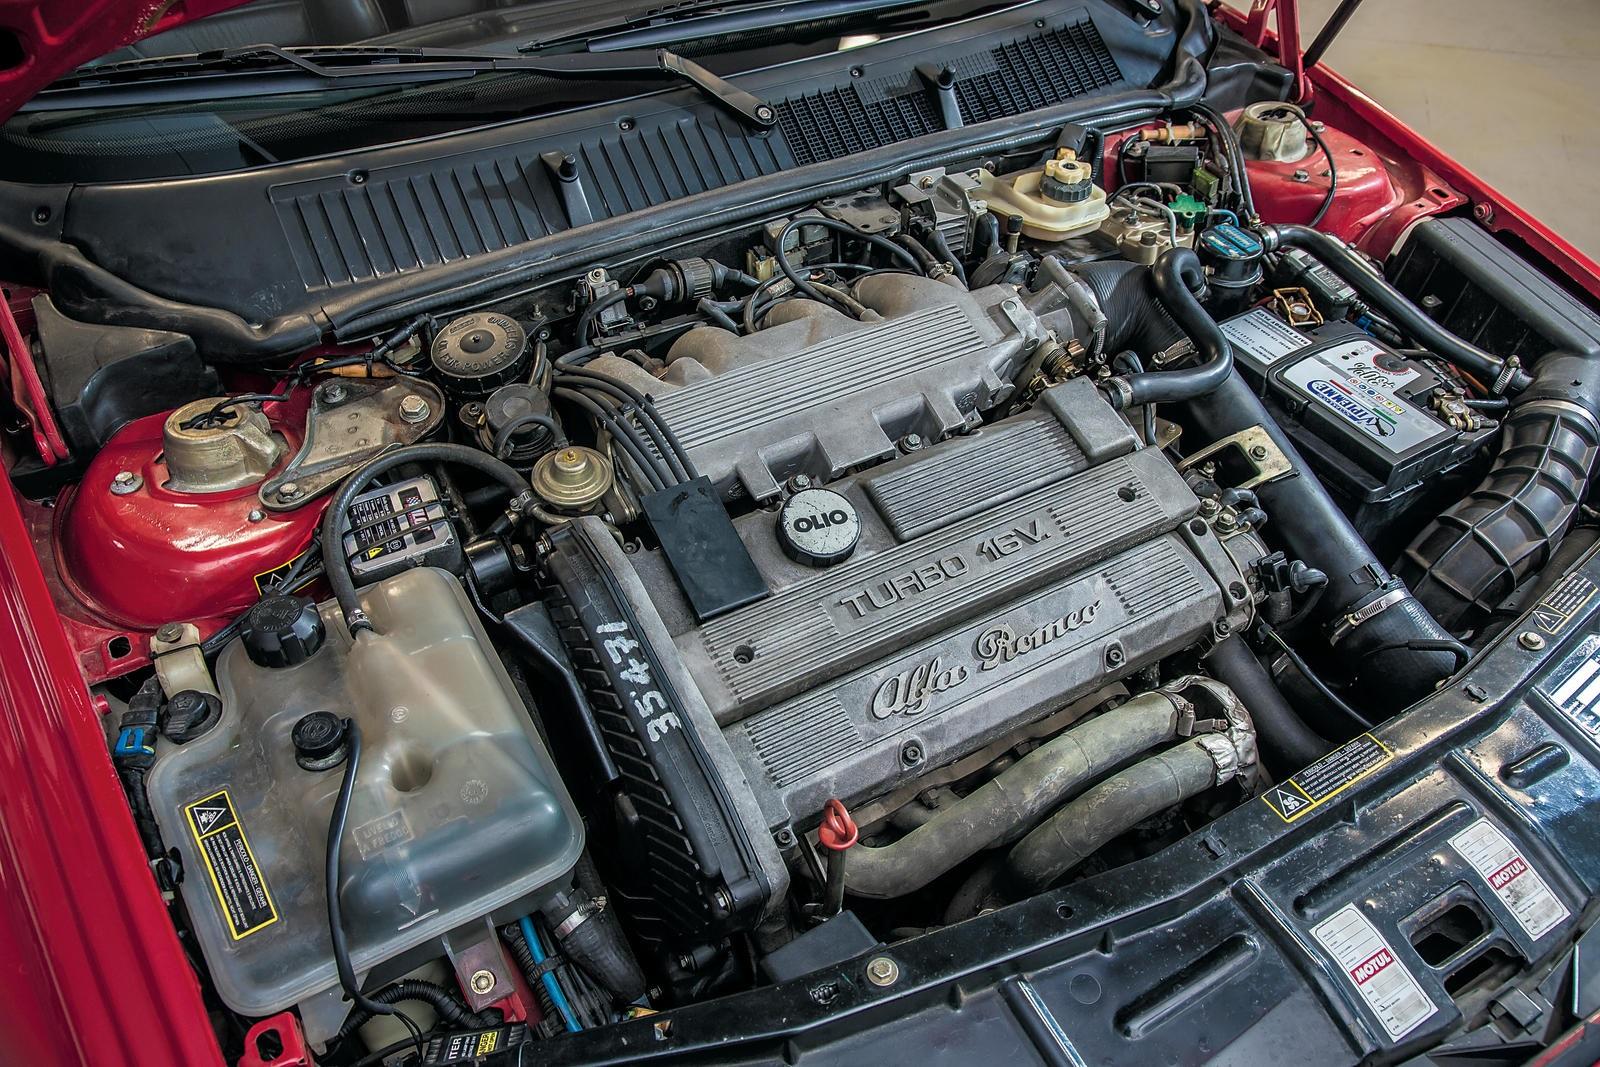 1993 Alfa Romeo 155 GTA Stradale Sports Saloon engine